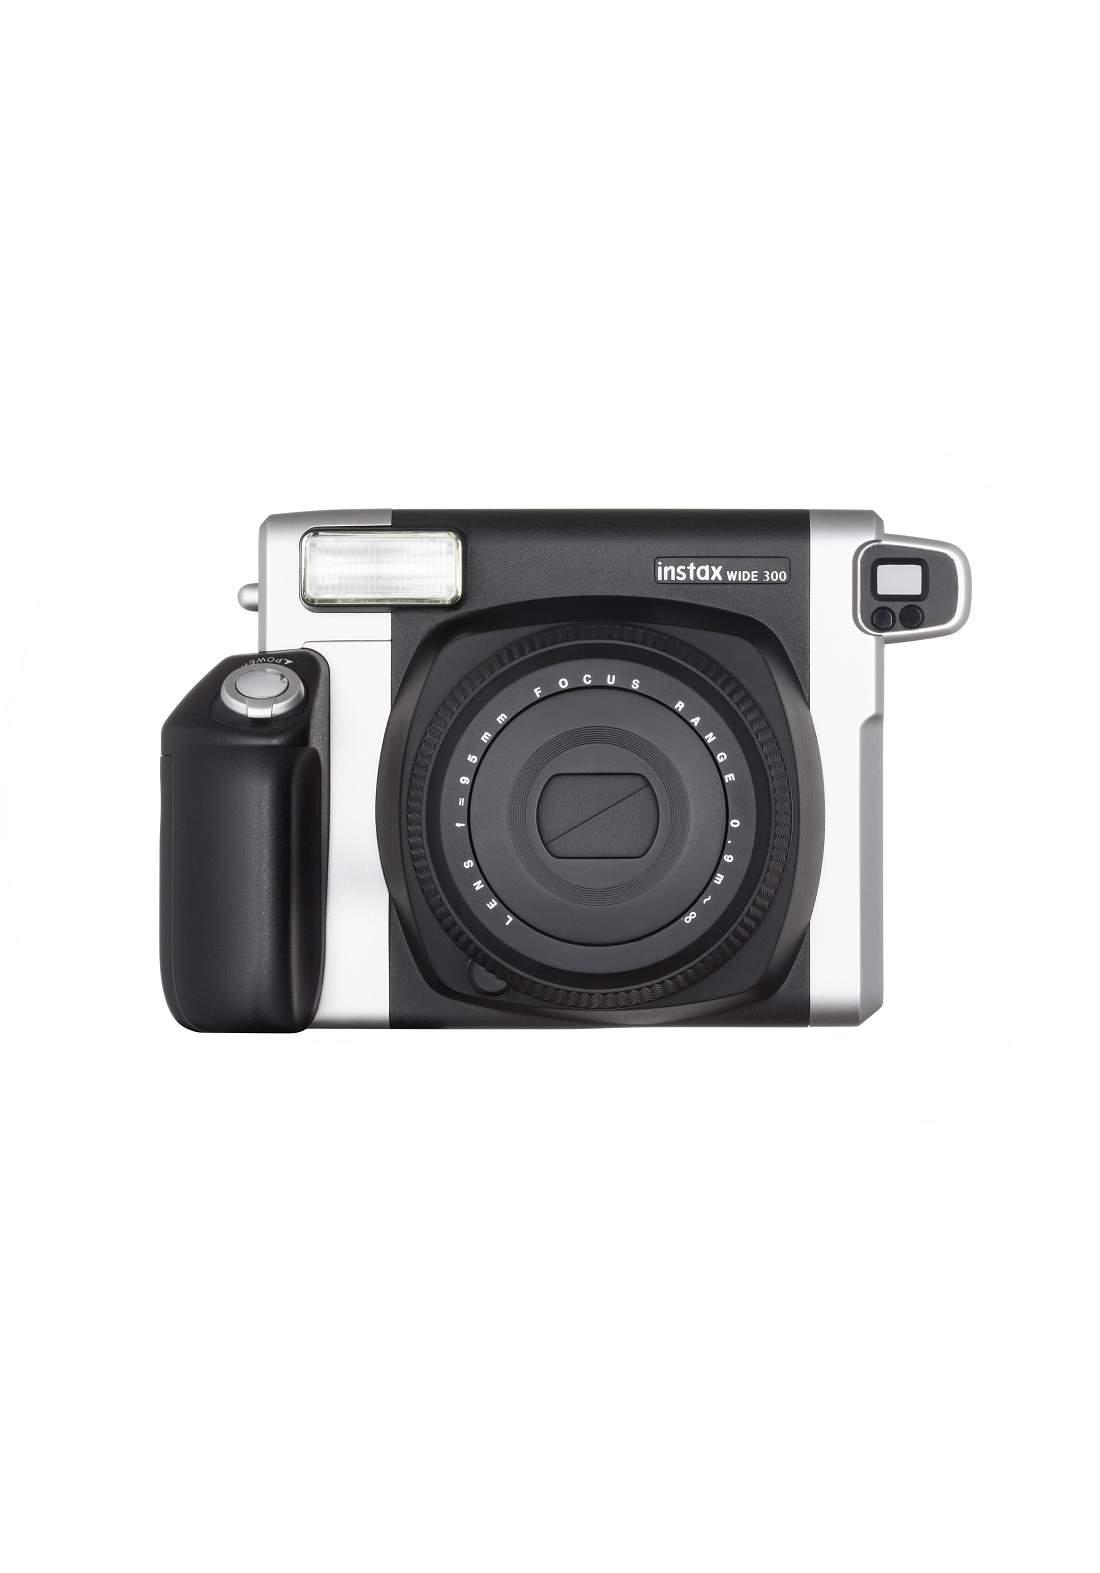 Fujifilm  Wide300  Instax Camera - Black  كاميرا